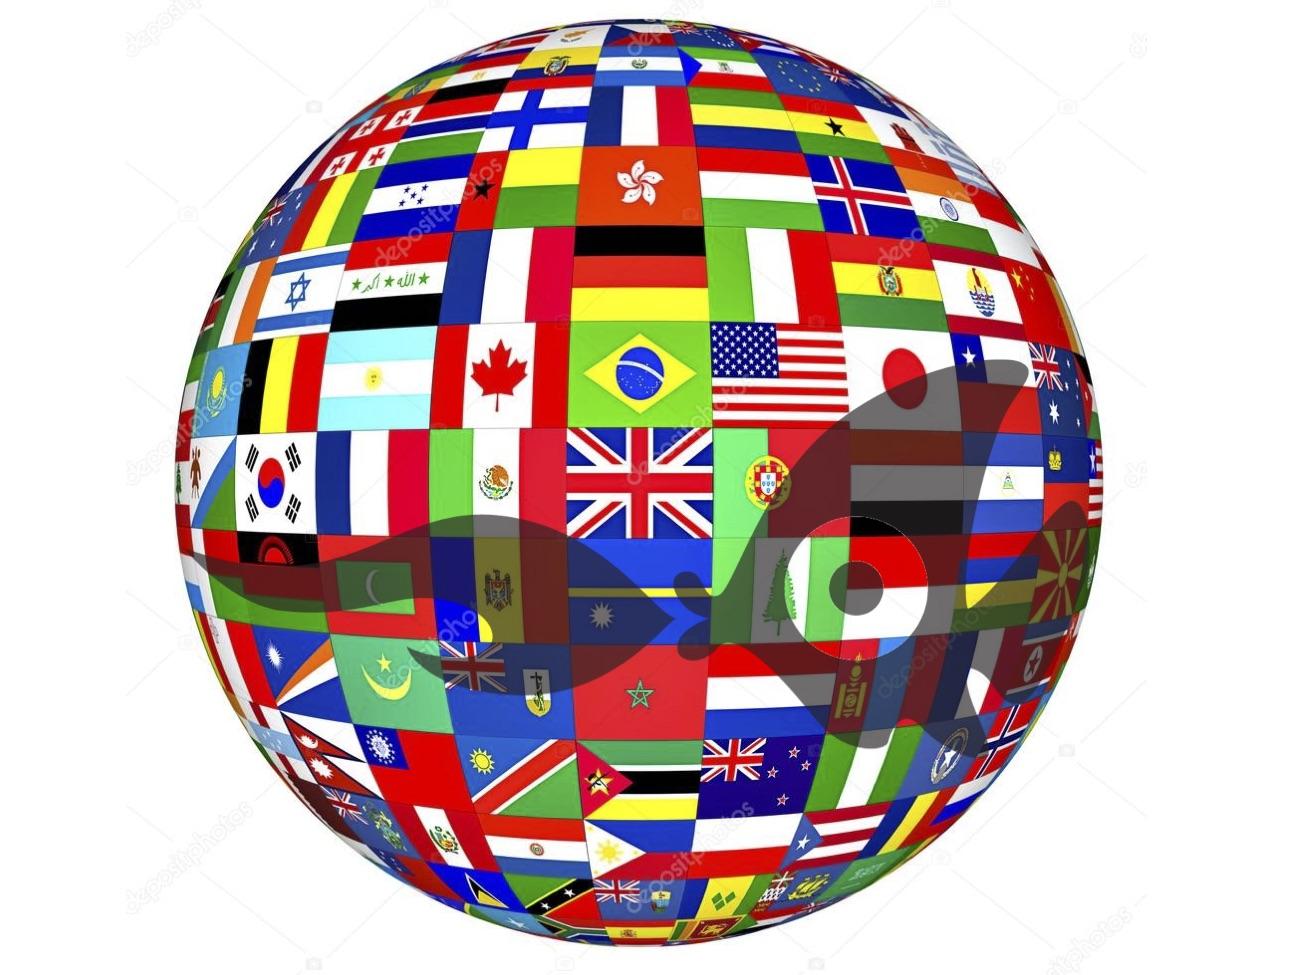 presente em 28 países